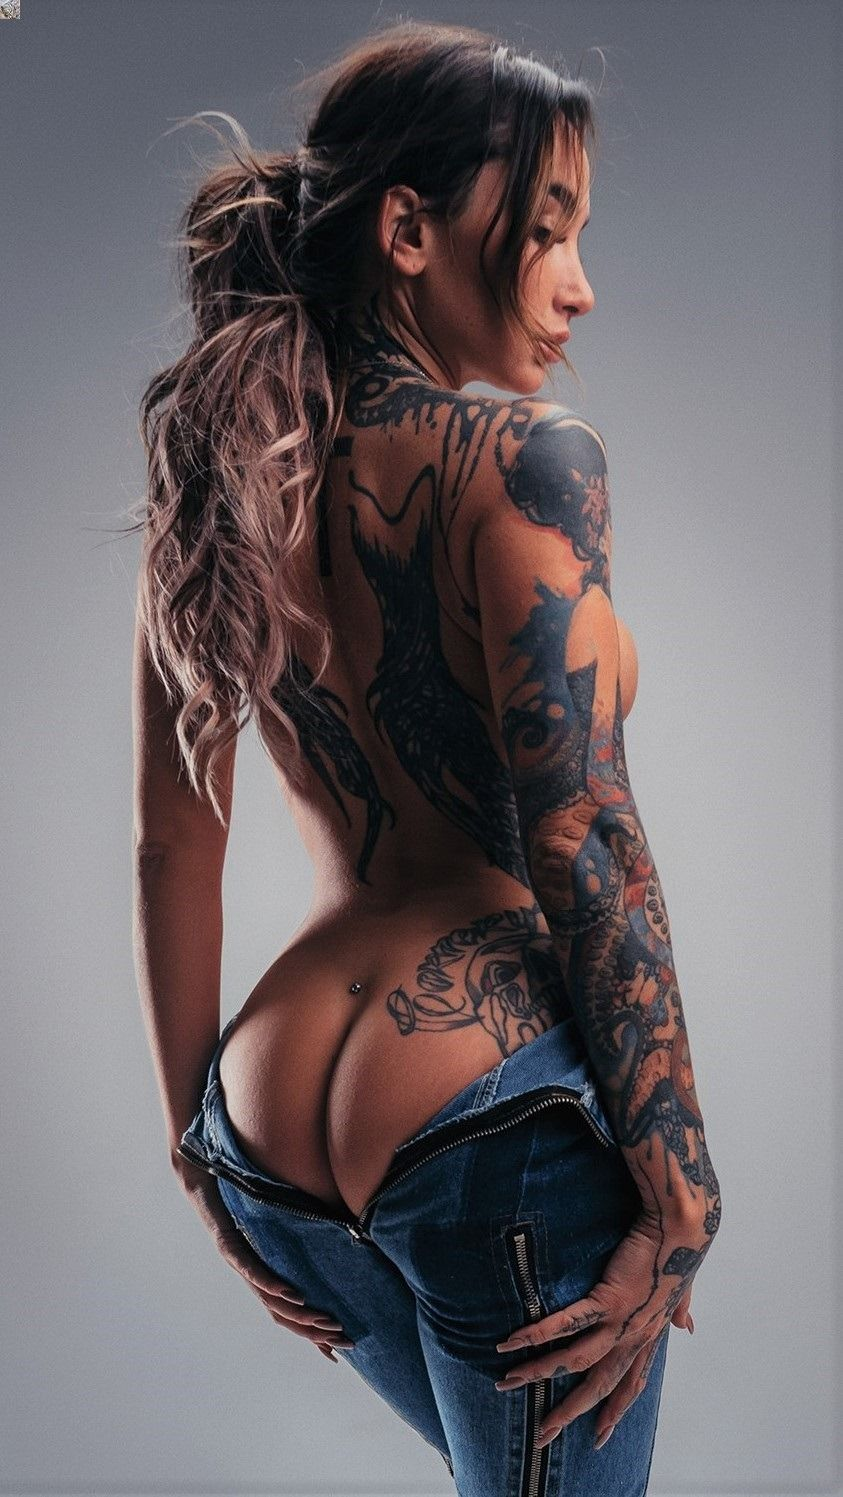 Lace bodysuit i saw it first  siberiansbeautifulity uc Ium Gonna Be ud  Tattooed ladies  Pinterest